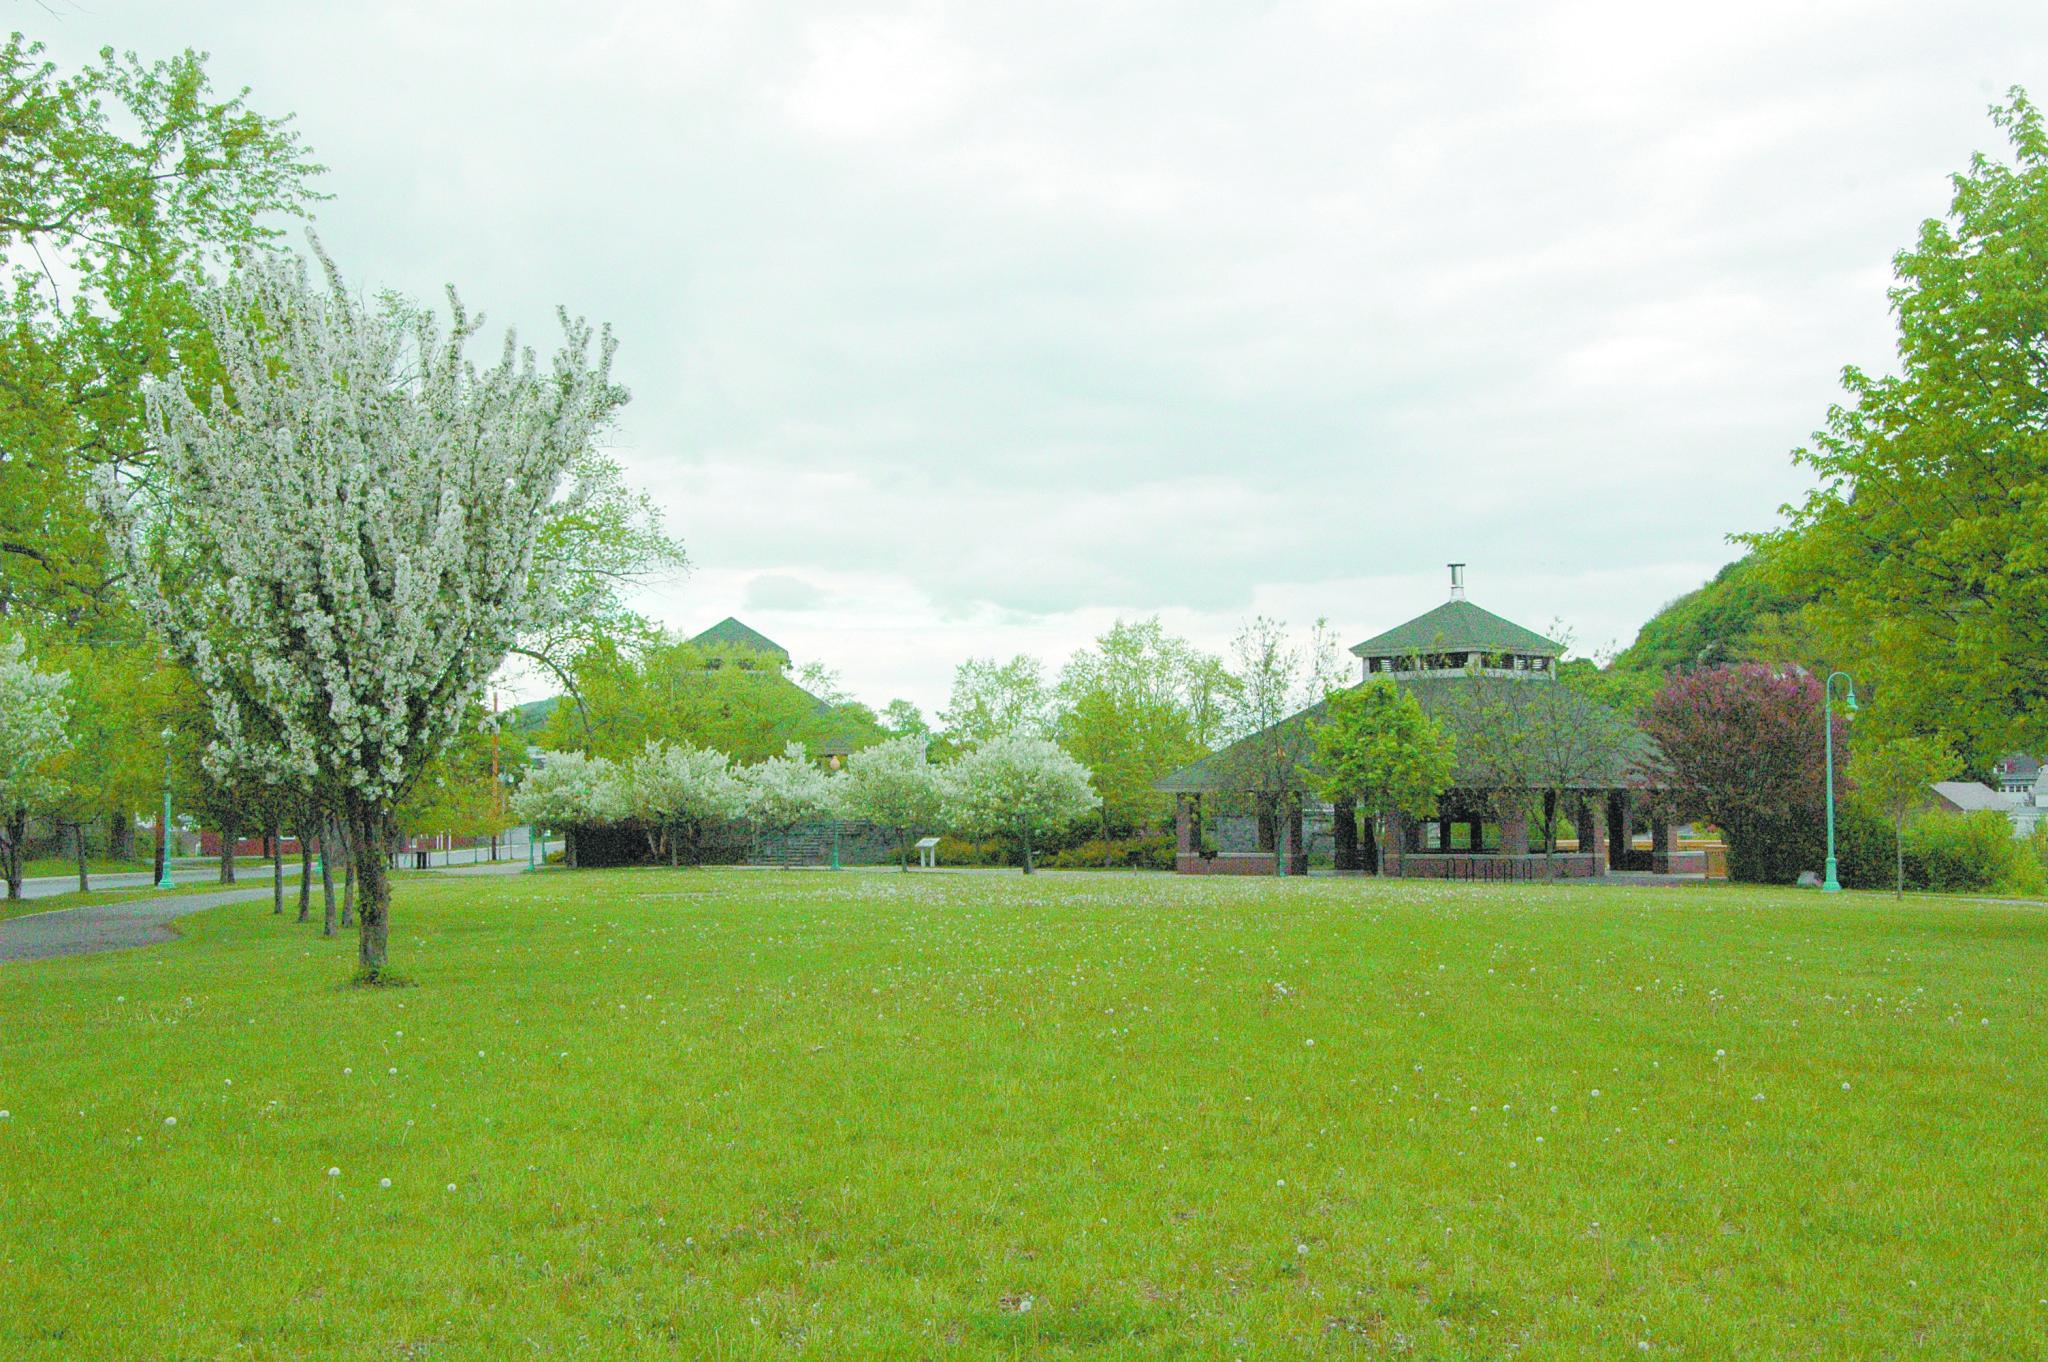 Town debates charging for waterfront park usage